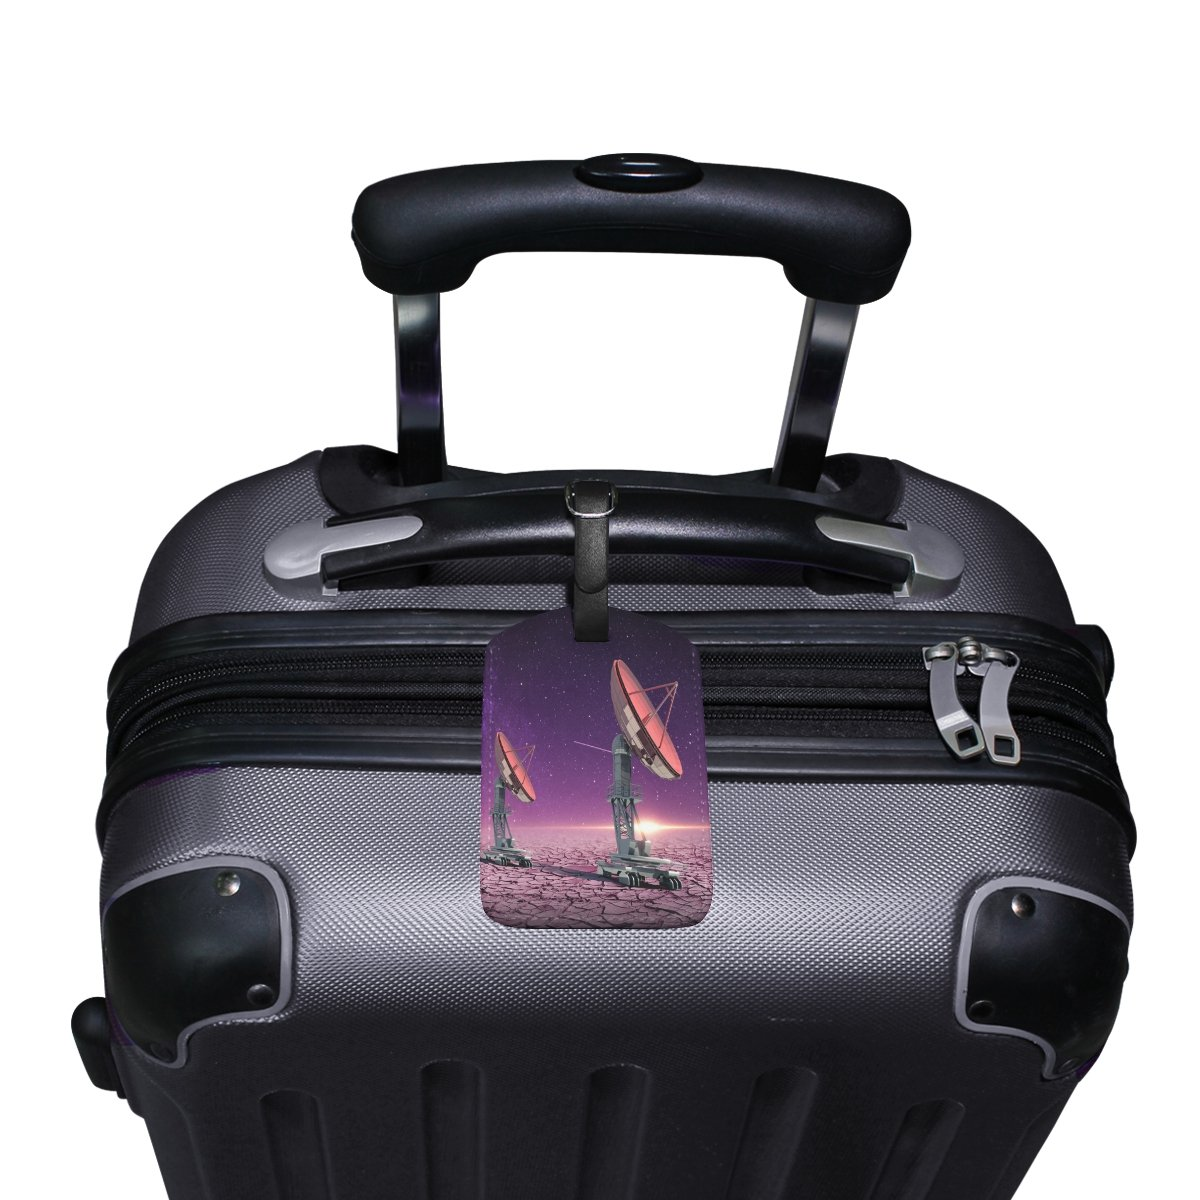 1Pcs Saobao Travel Luggage Tag Creative Star Radar Map PU Leather Baggage Suitcase Travel ID Bag Tag